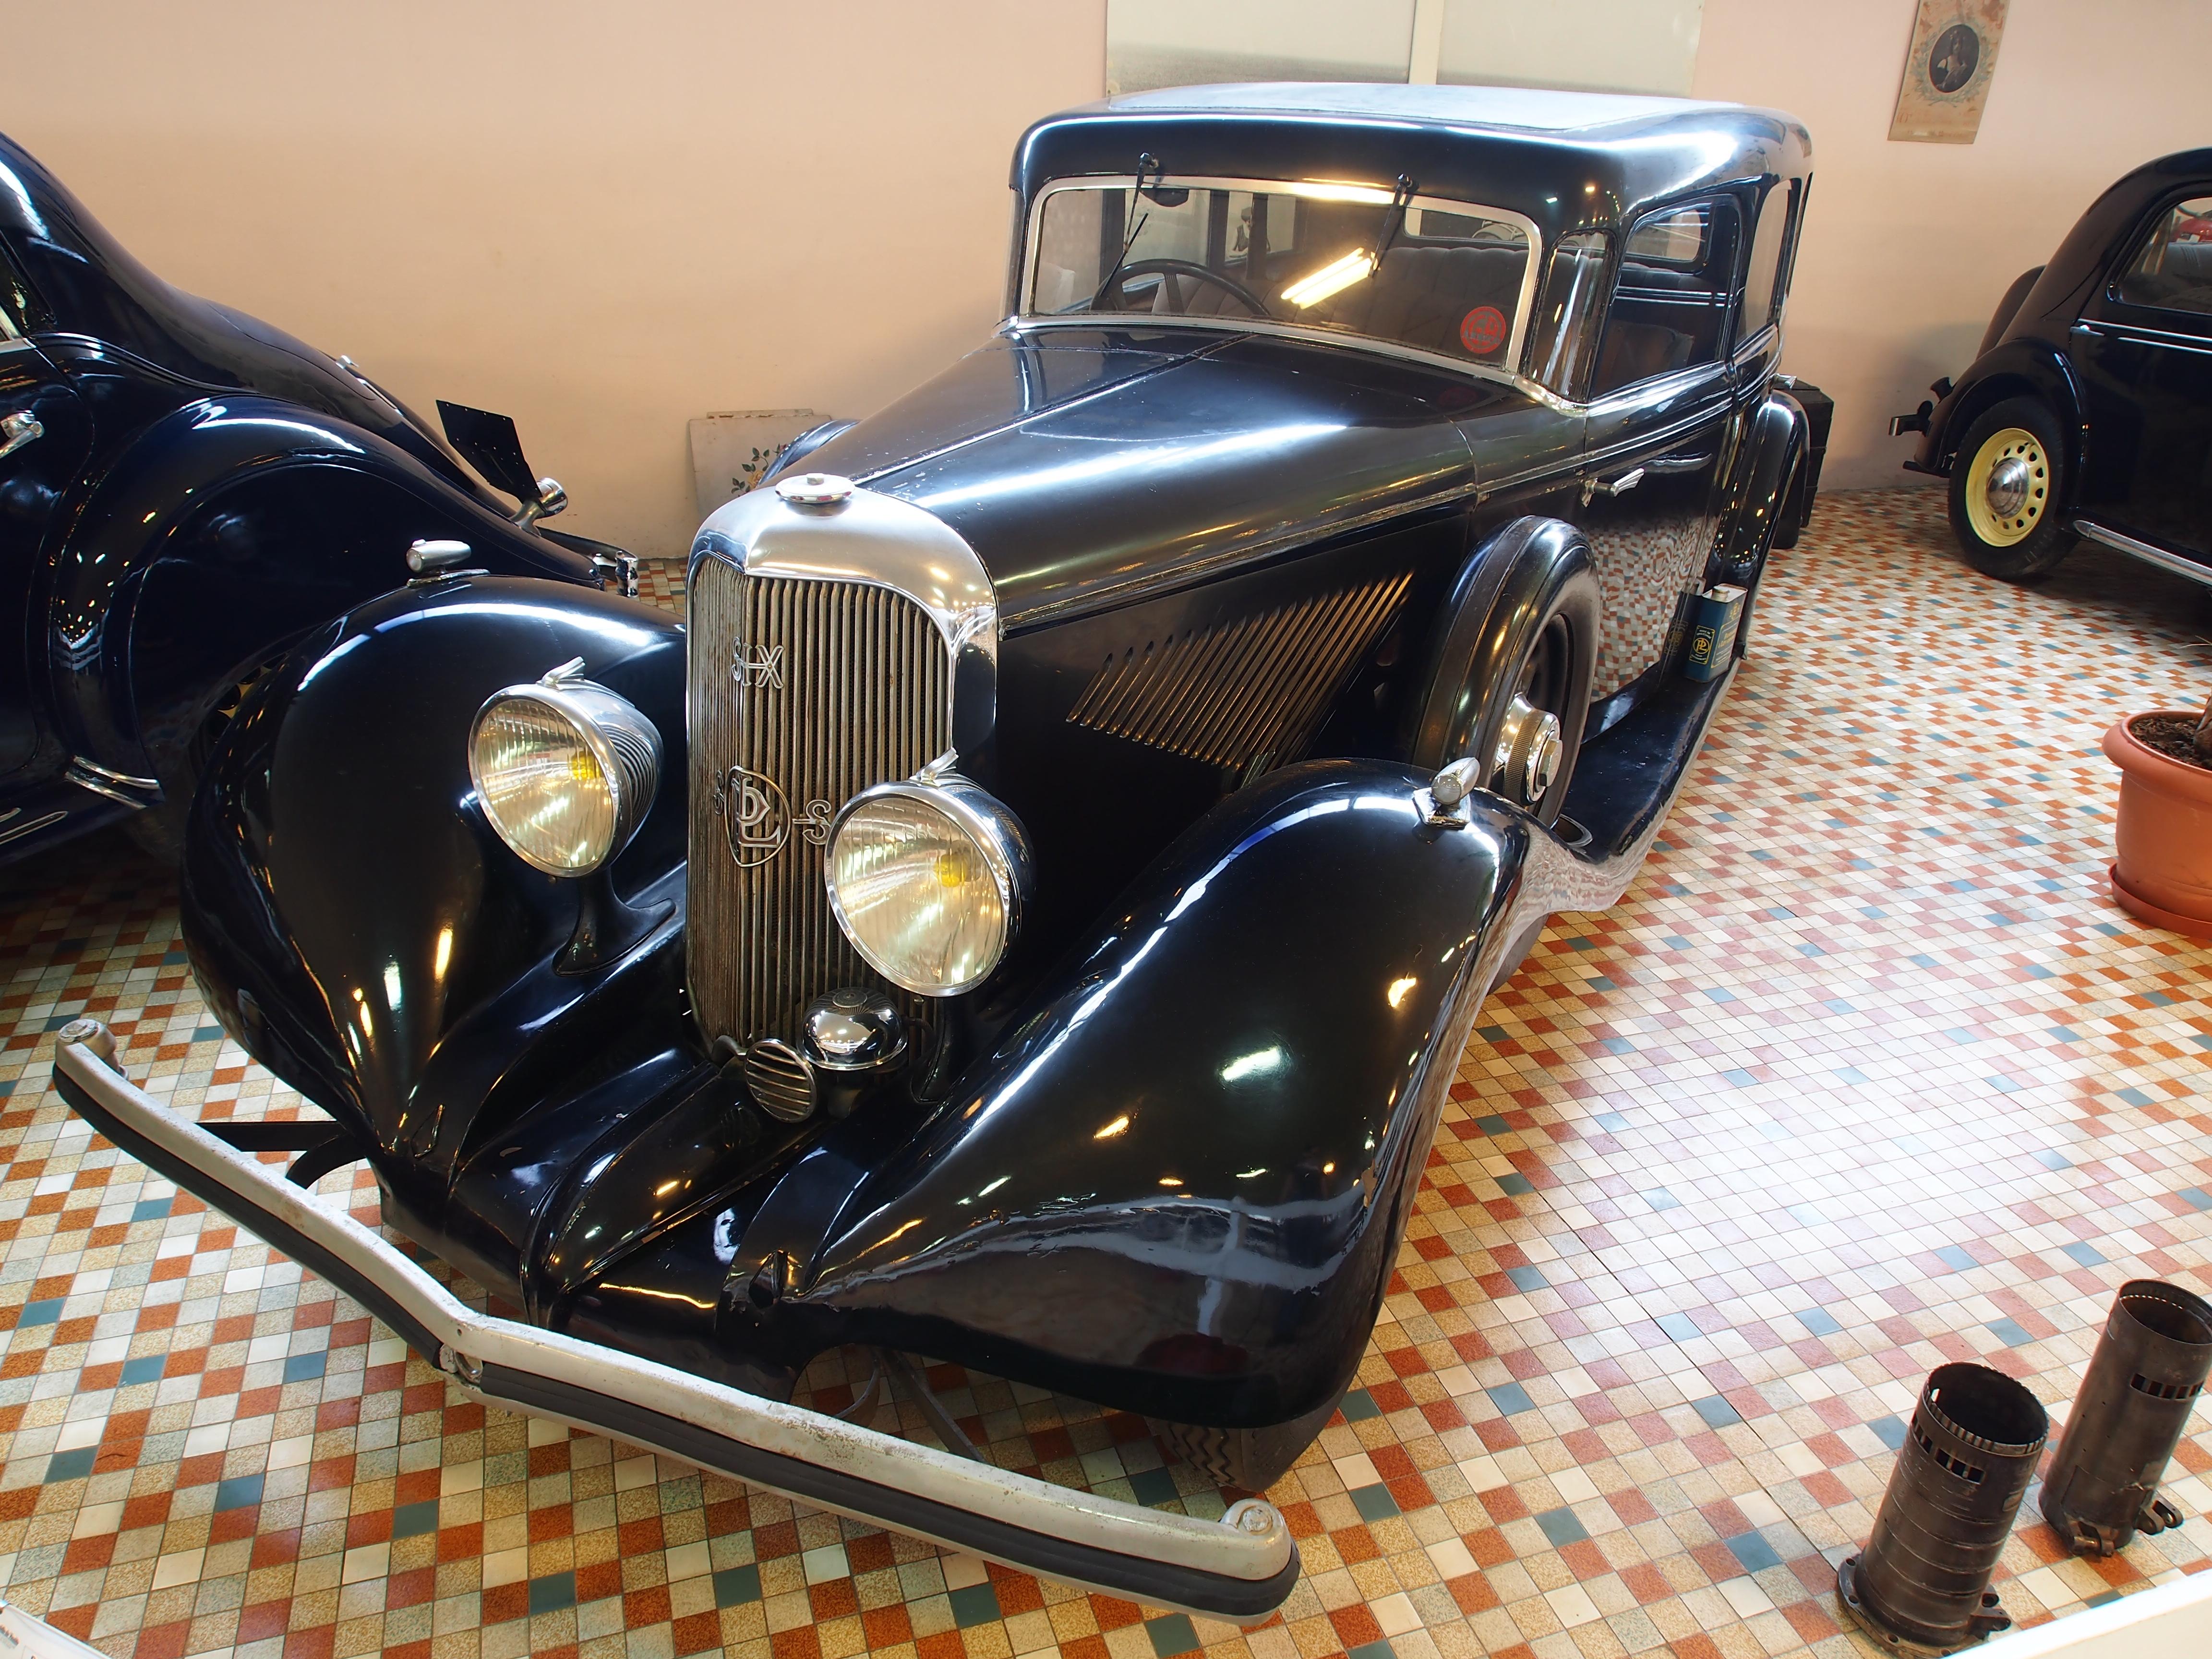 file 1936 panhard levassor x72 panoramique at the mus e automobile de vend e pic 2 jpg. Black Bedroom Furniture Sets. Home Design Ideas